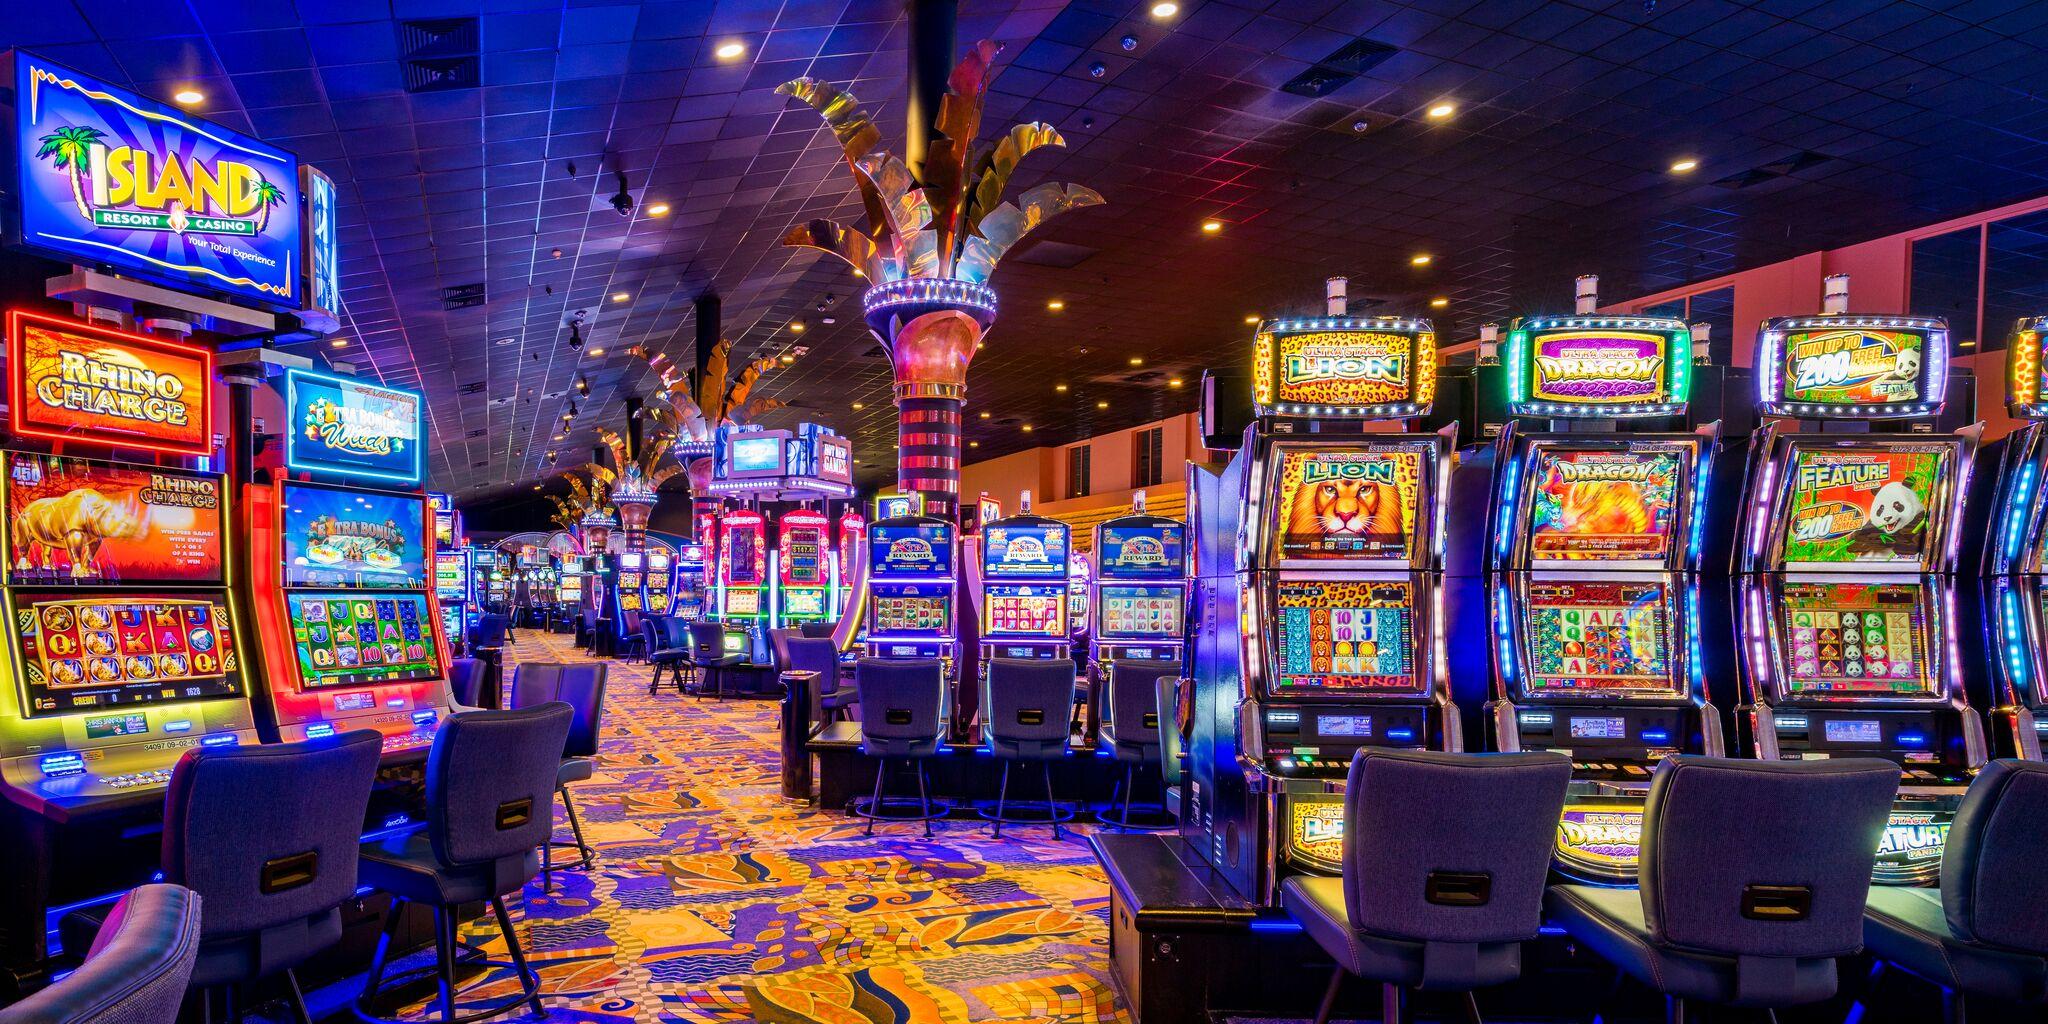 UPDATE: Island Resort and Casino to reopen on May 16 | WJMN - UPMatters.com